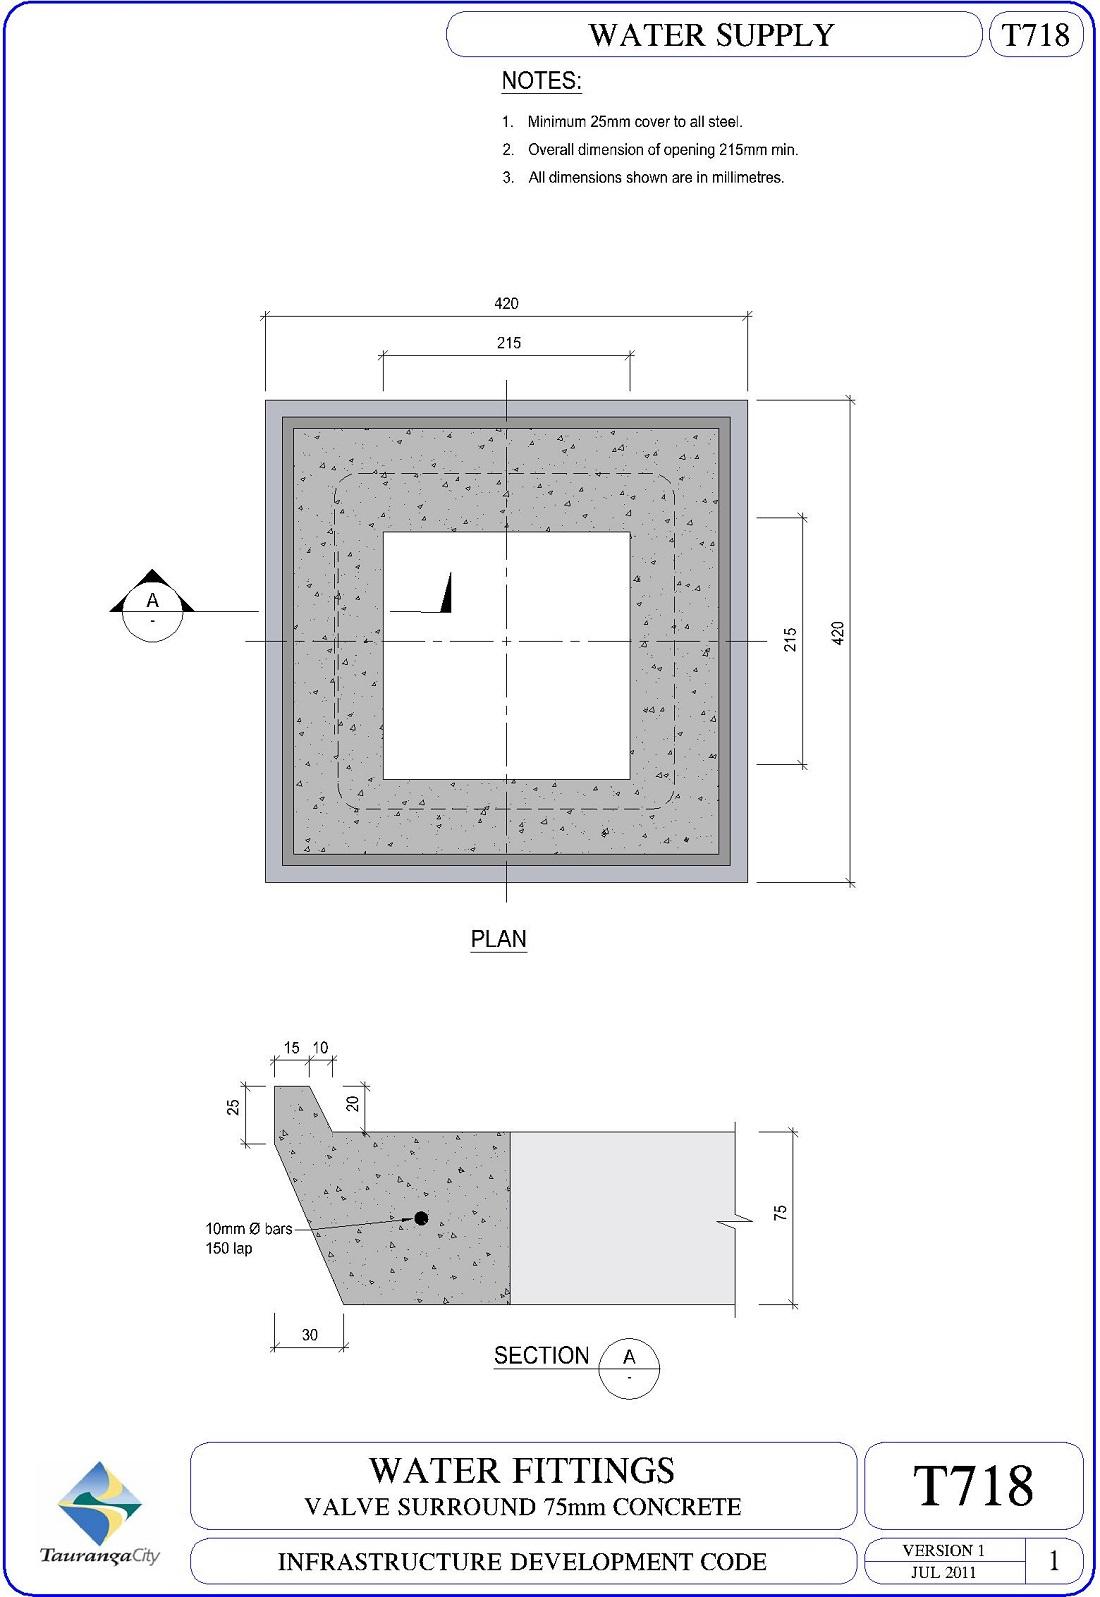 Valve Surround 75mm Concrete